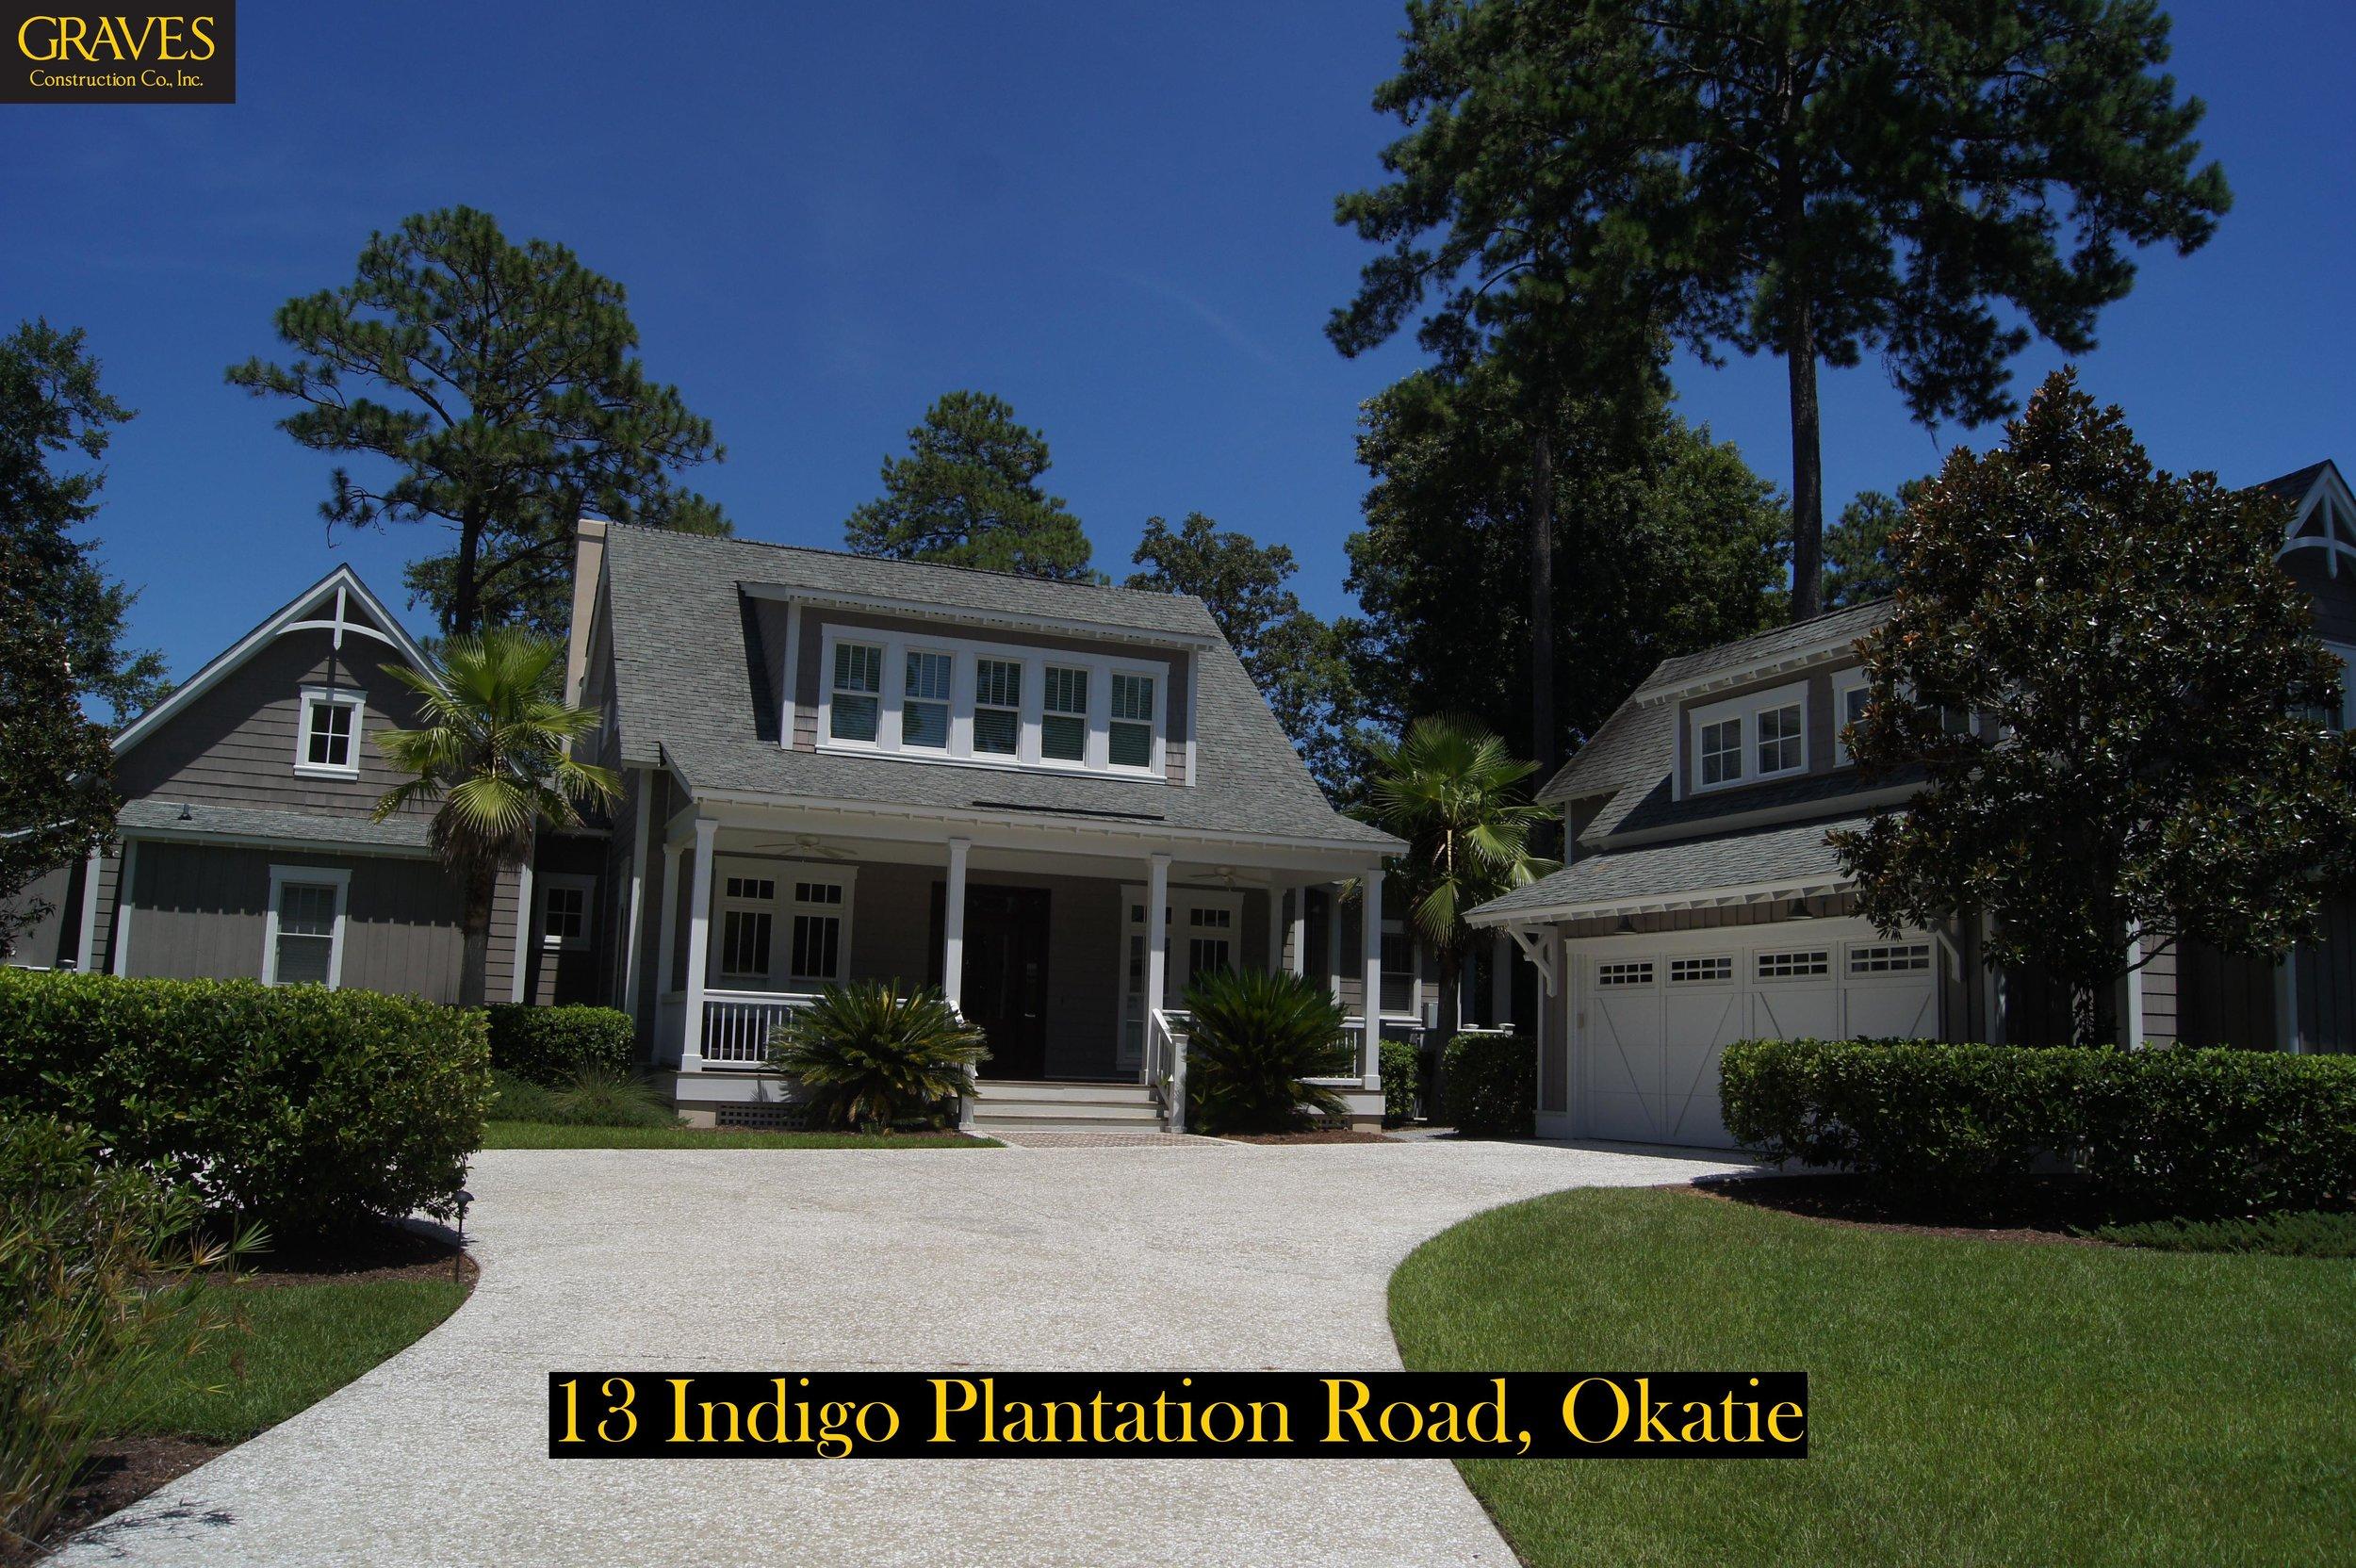 13 Indigo Plantation Rd - 4